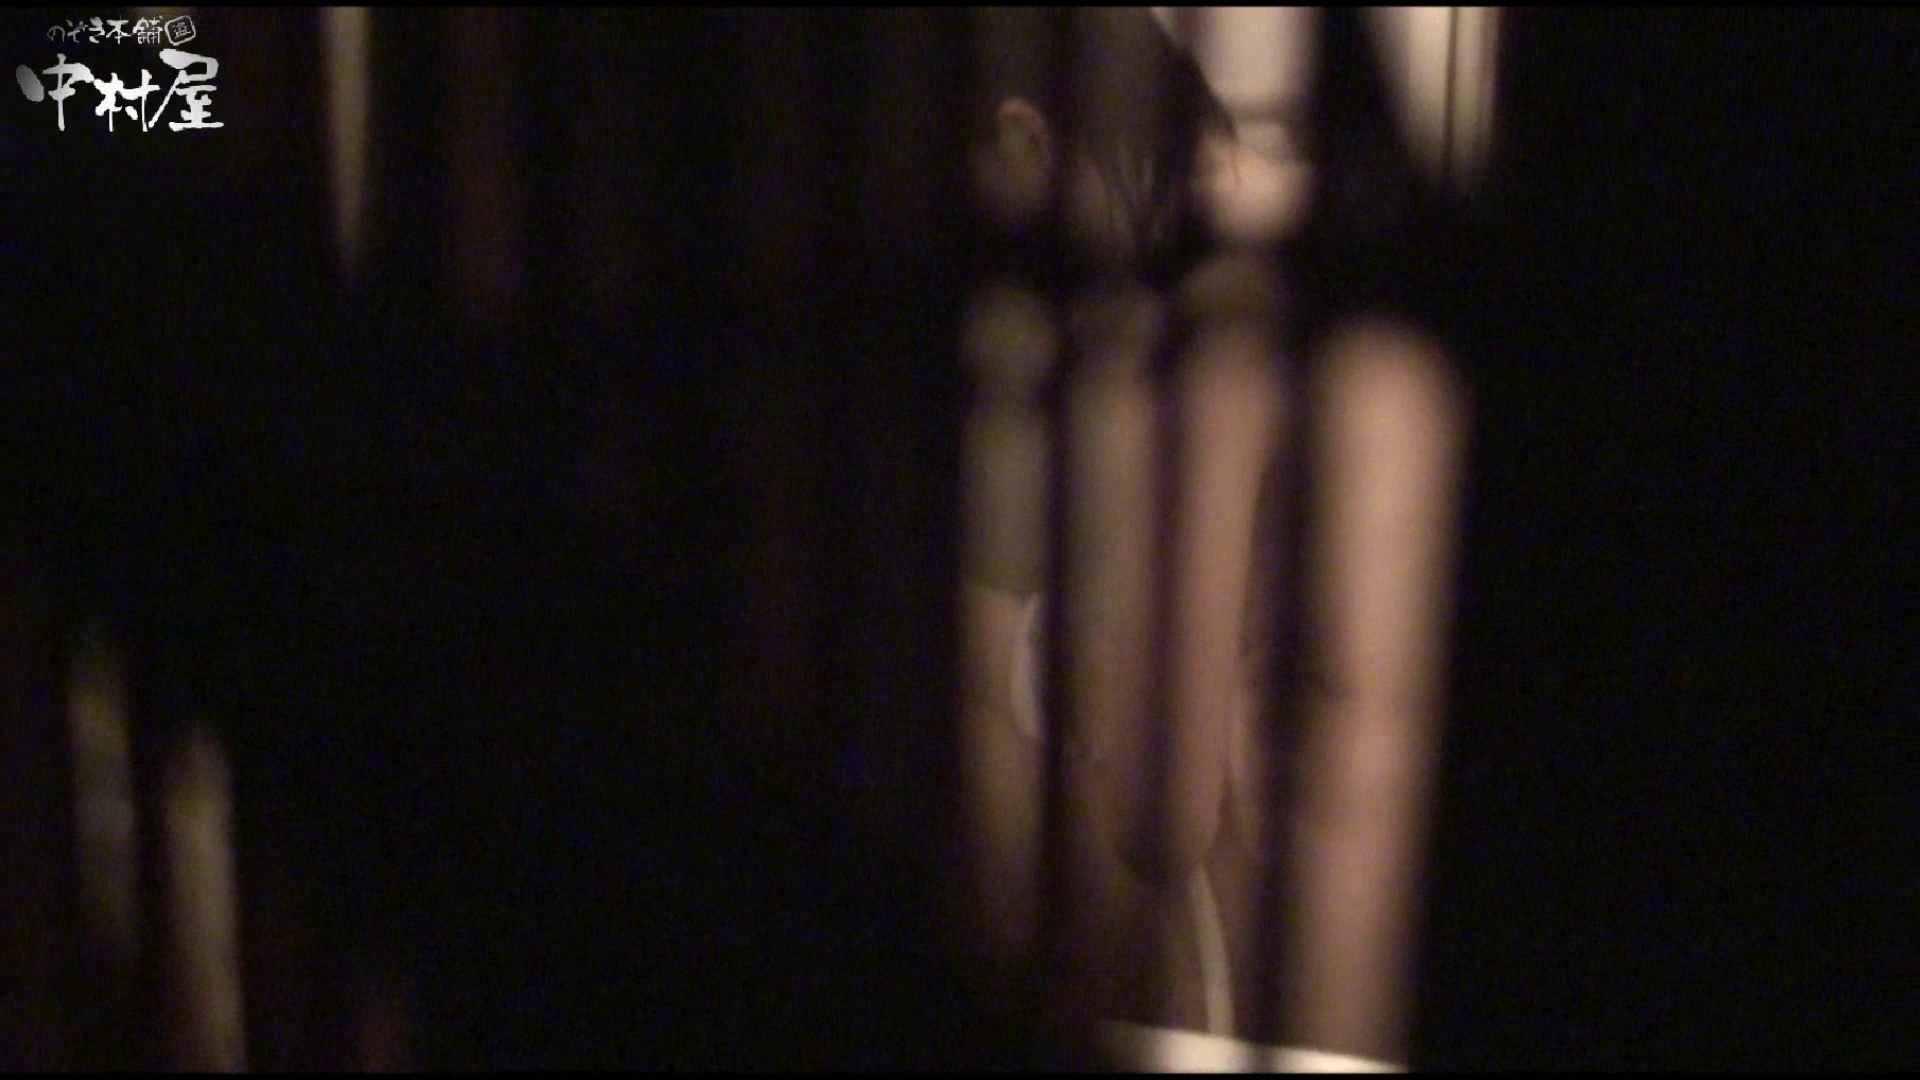 民家風呂専門盗撮師の超危険映像 vol.028 OLハメ撮り  28Pix 19